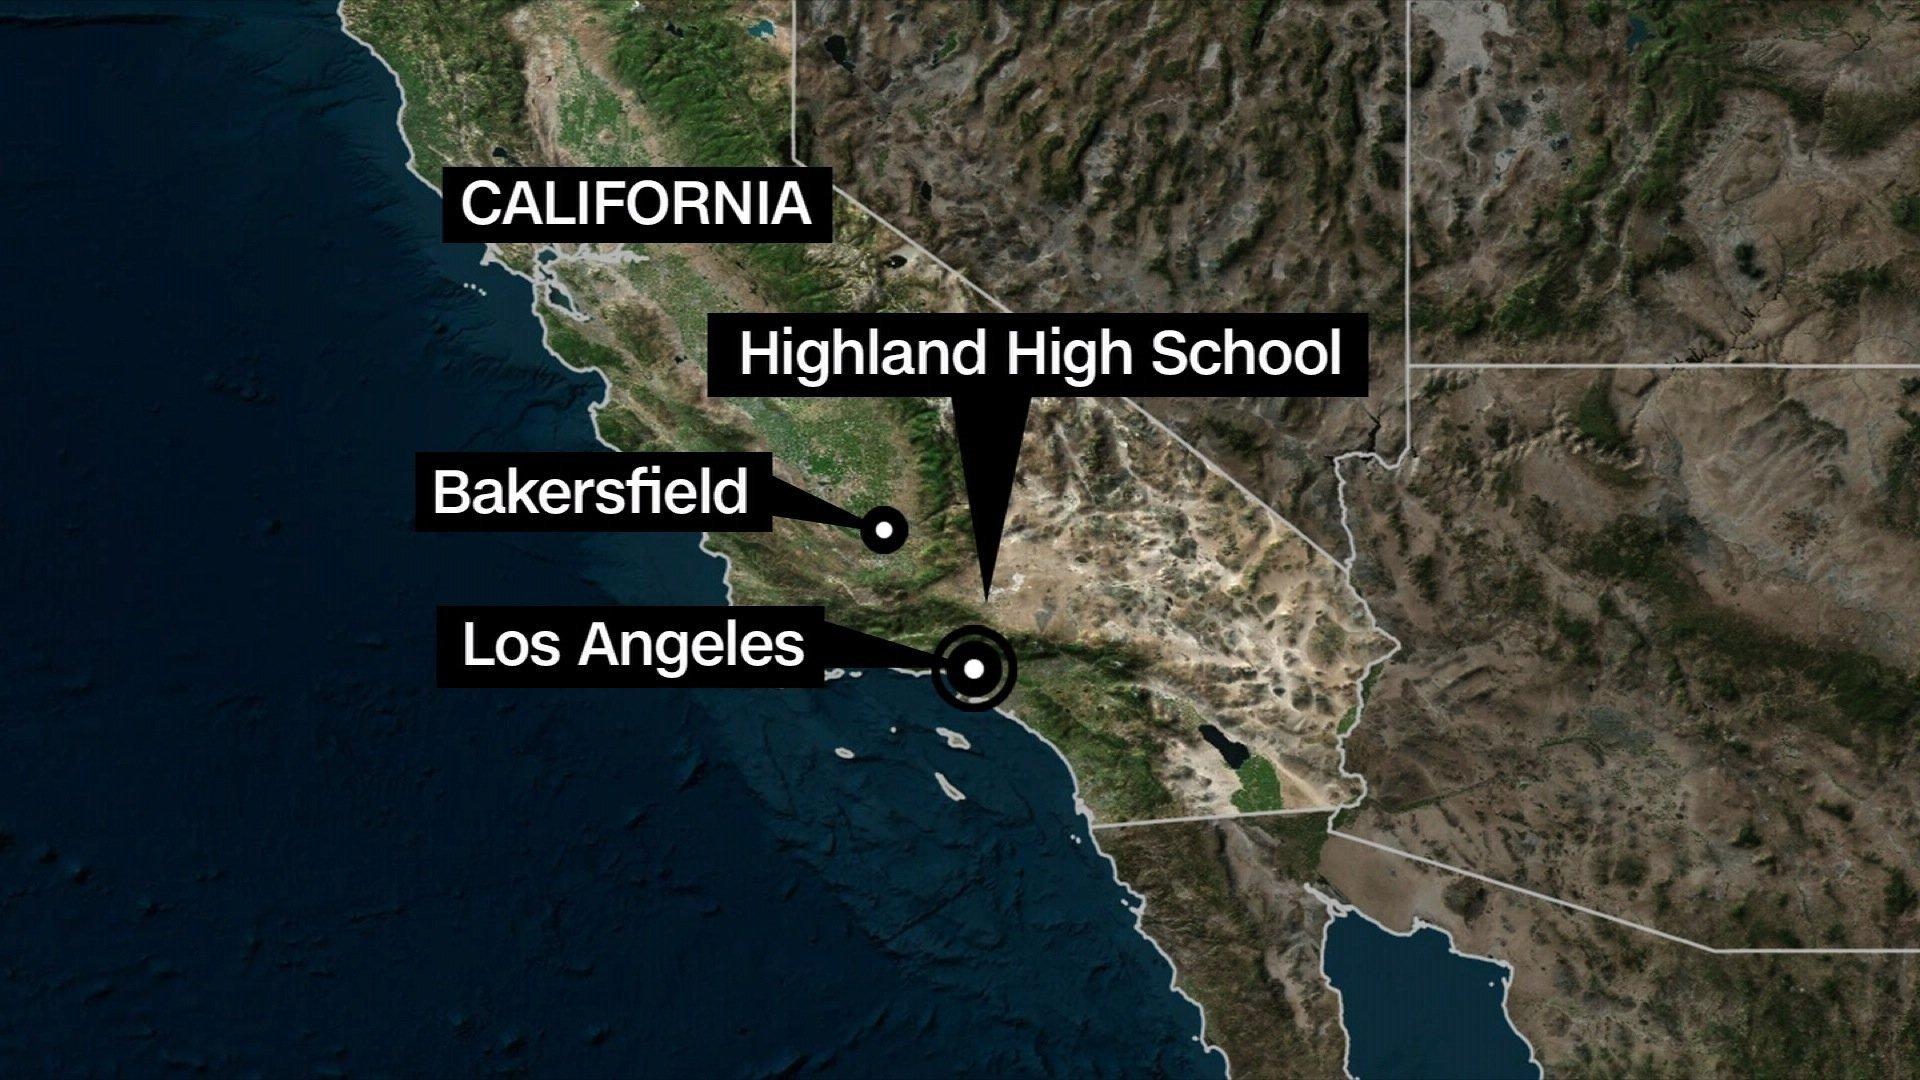 California school shooting suspect in custody, 1 injured